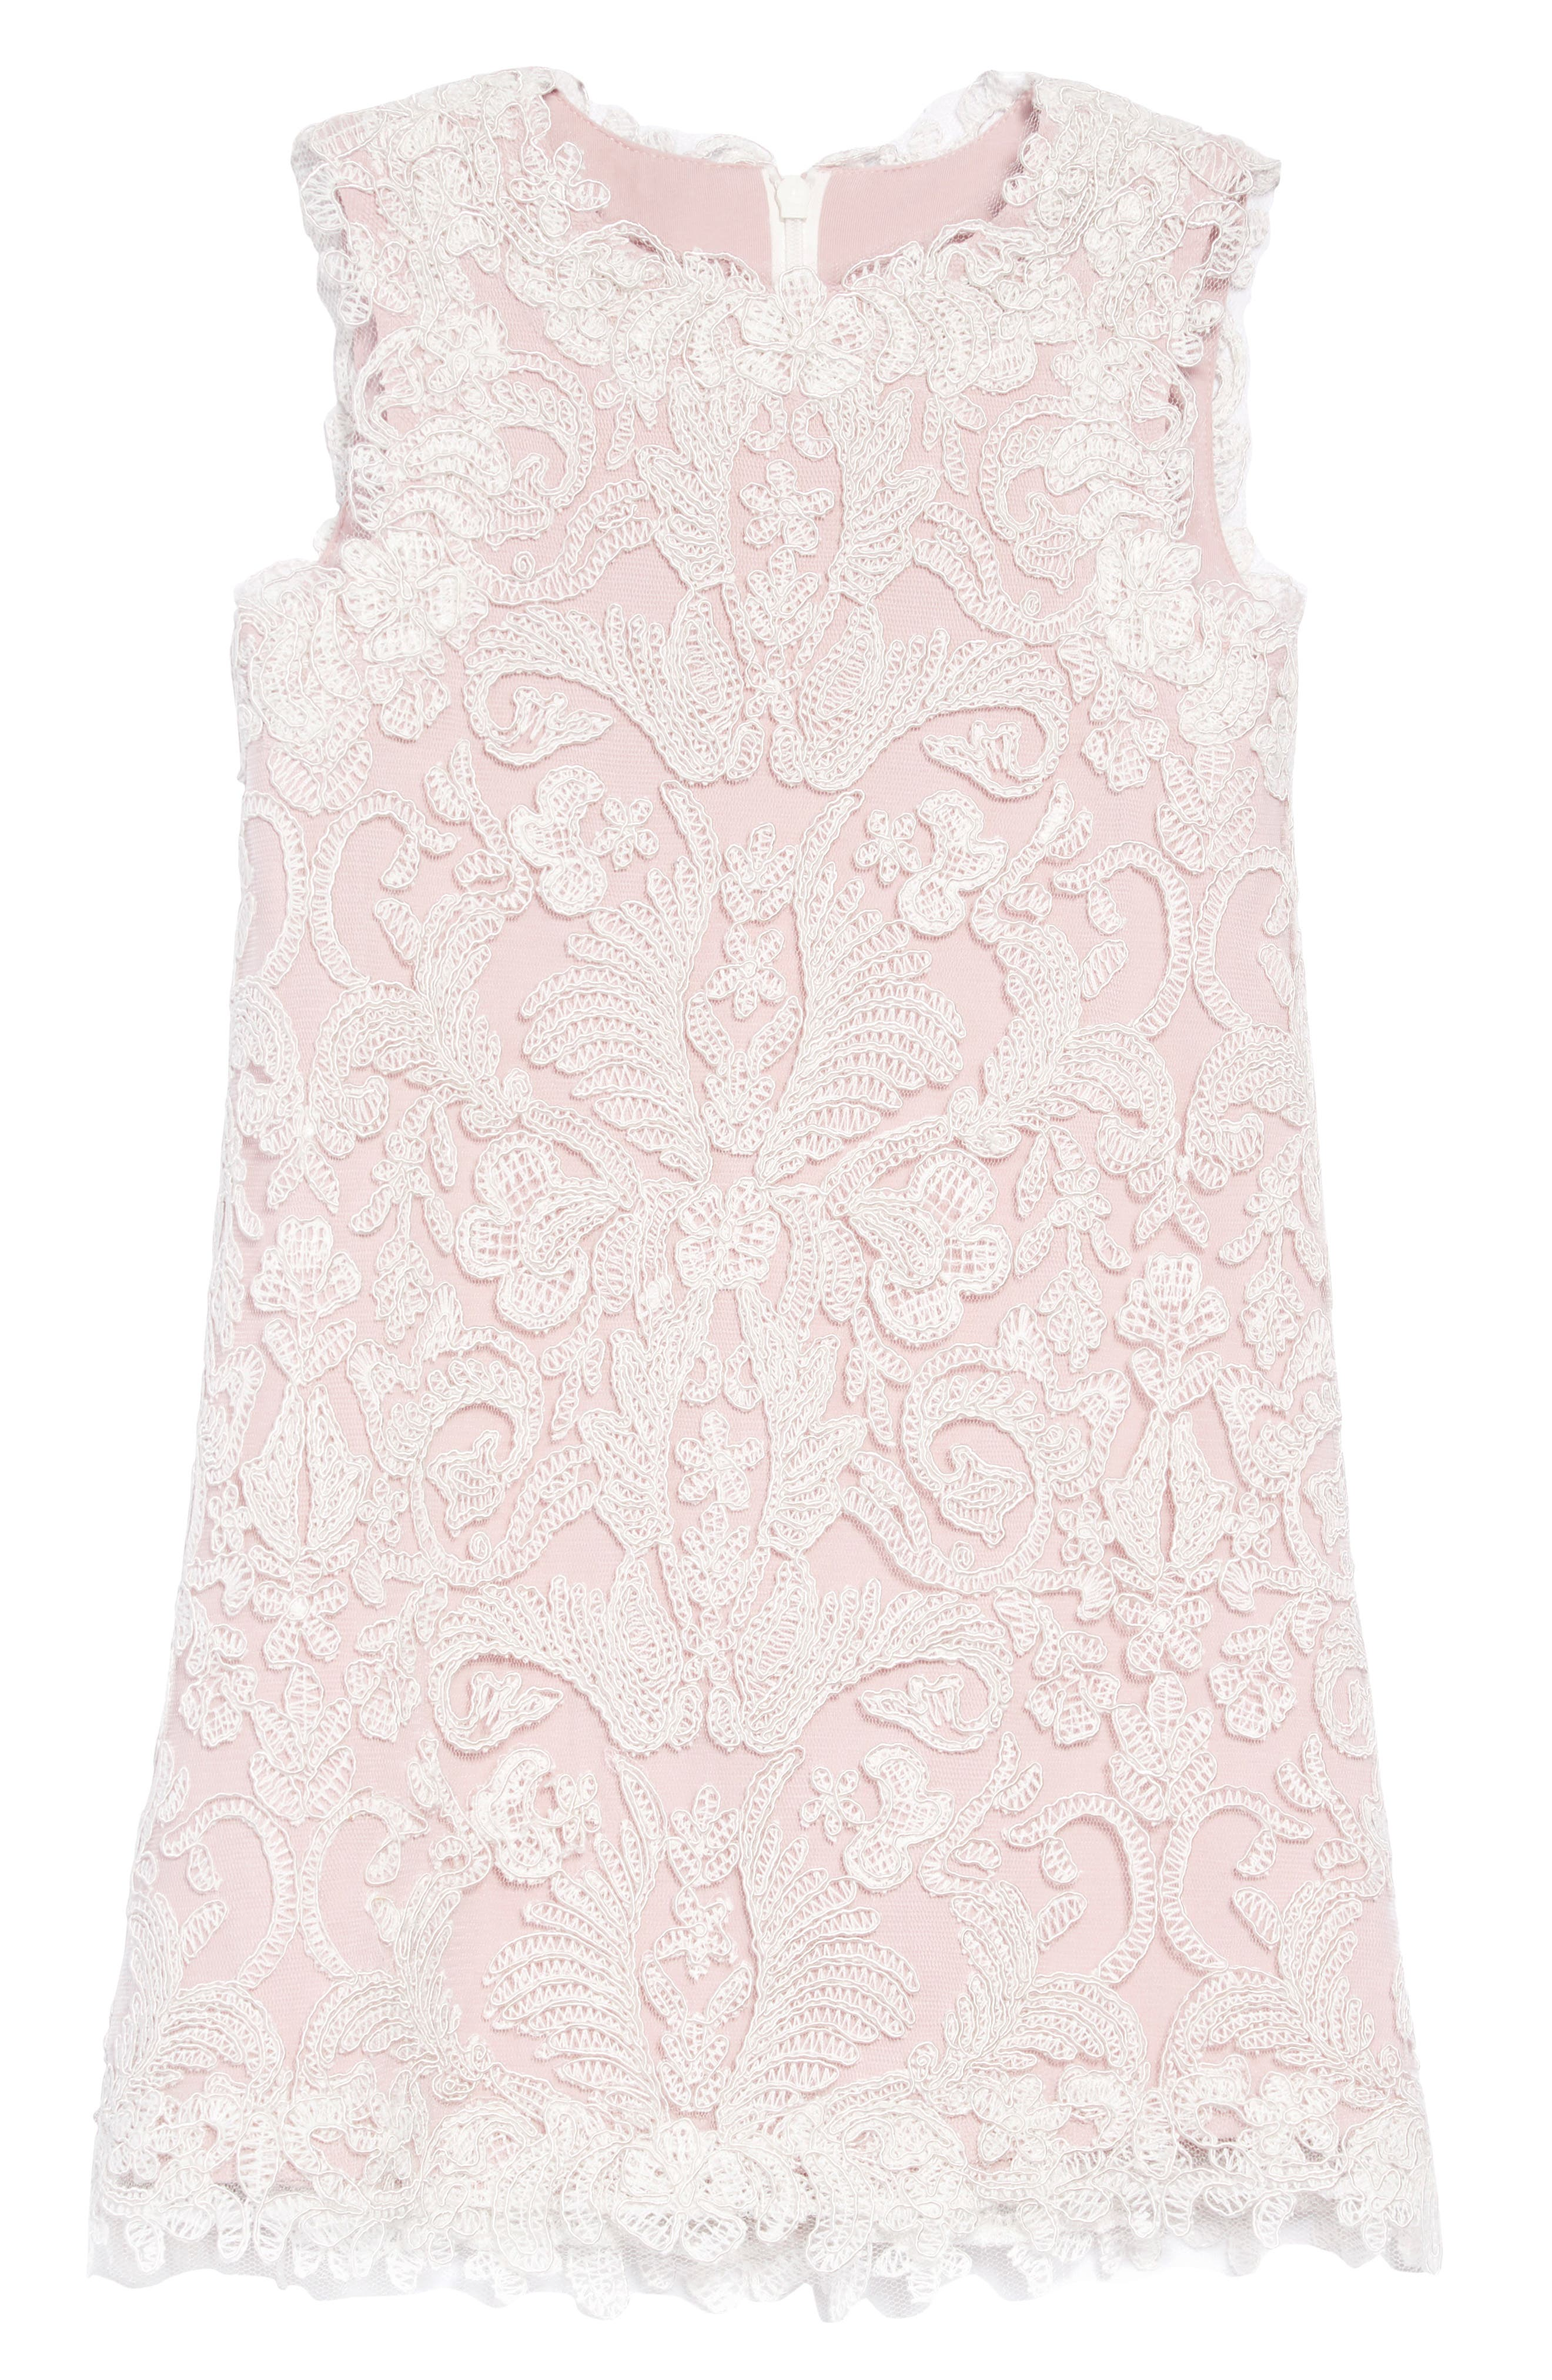 Embroidered Sheath Dress,                             Main thumbnail 1, color,                             IVORY/ PETAL